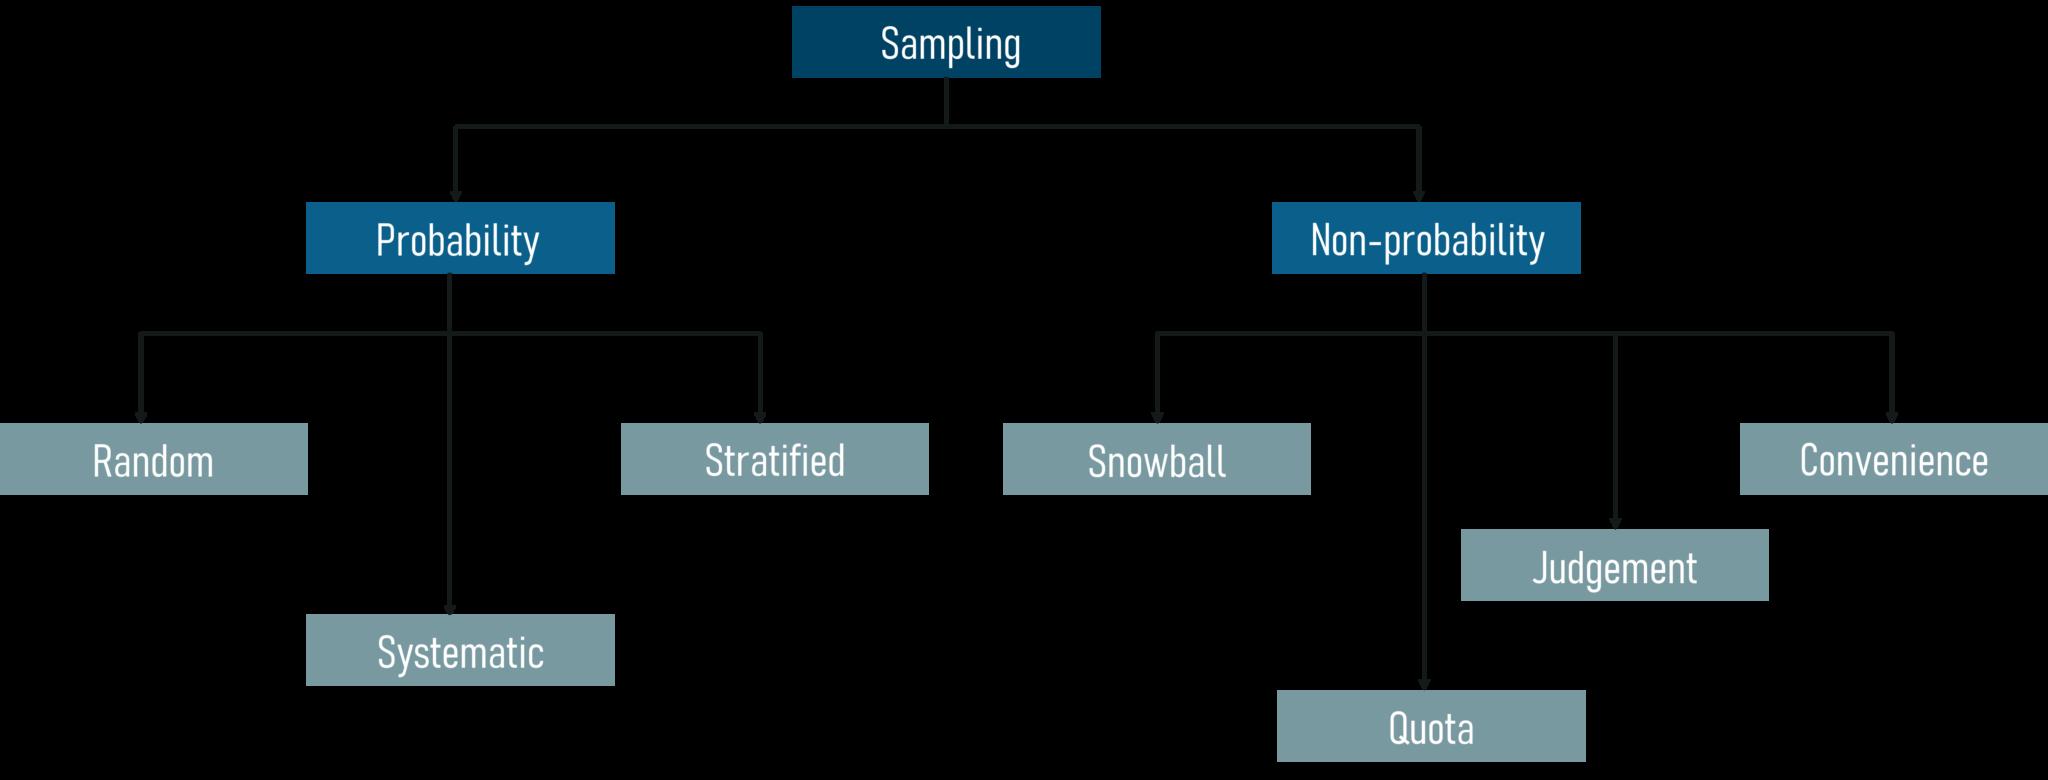 A Complete Tutorial On Statistics And Probability | Edureka